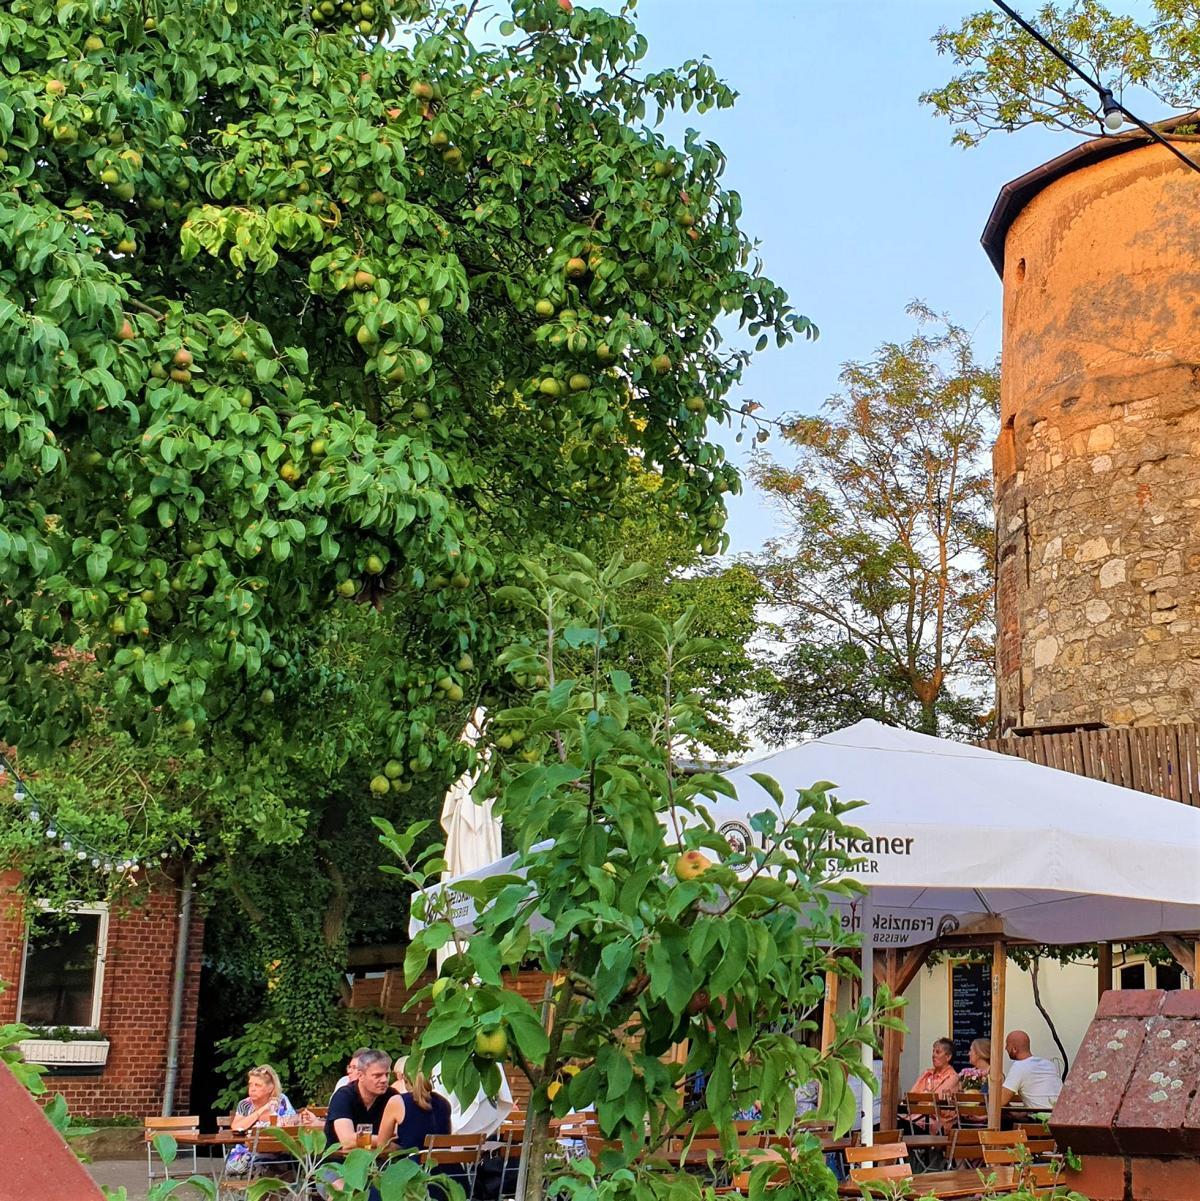 Style Hannover Biergarten Lindener Turm - Biergärten in Hannover